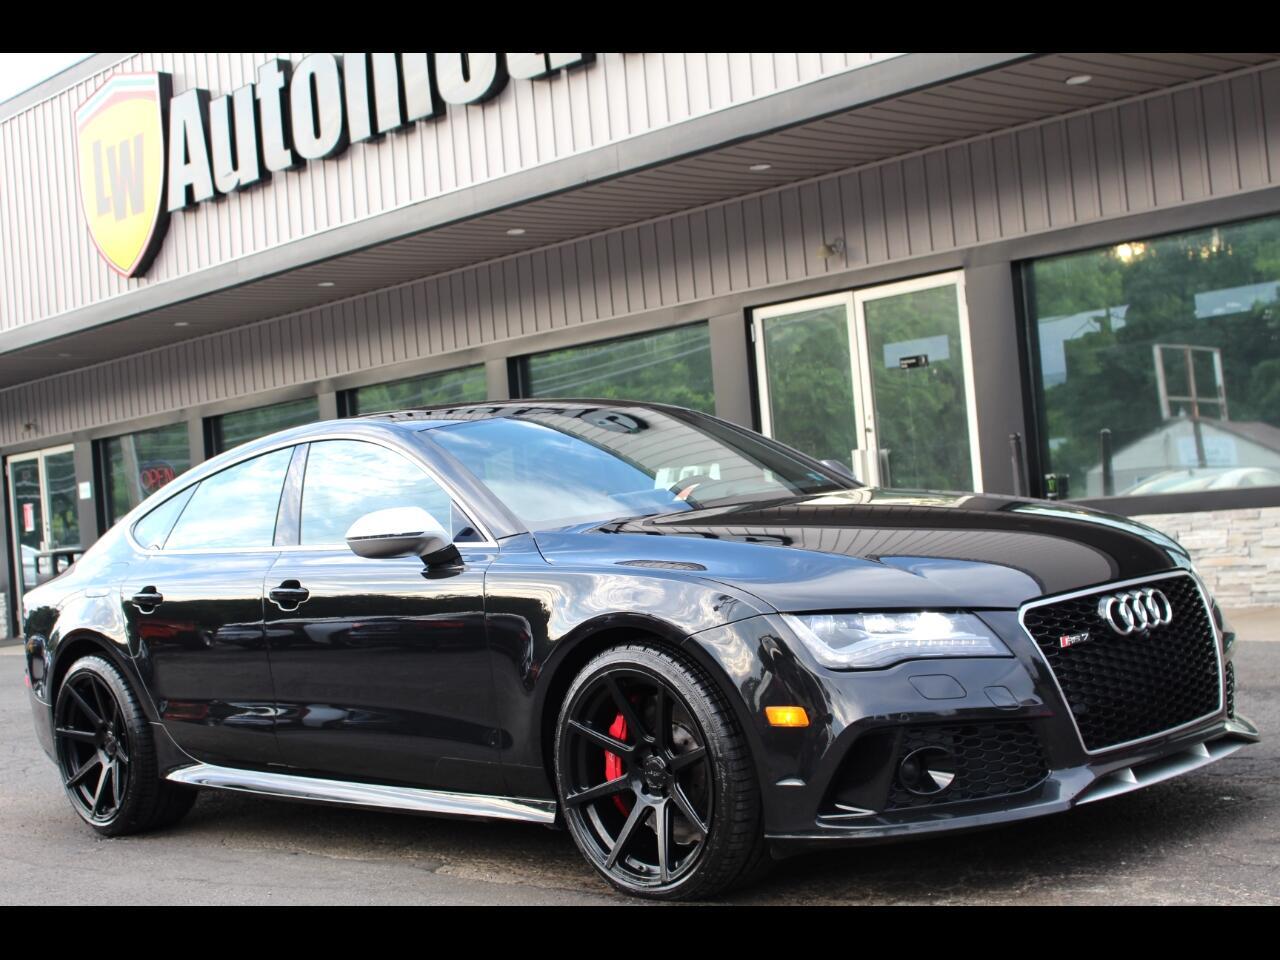 2015 Audi RS 7 4.0 TFSI performance Prestige